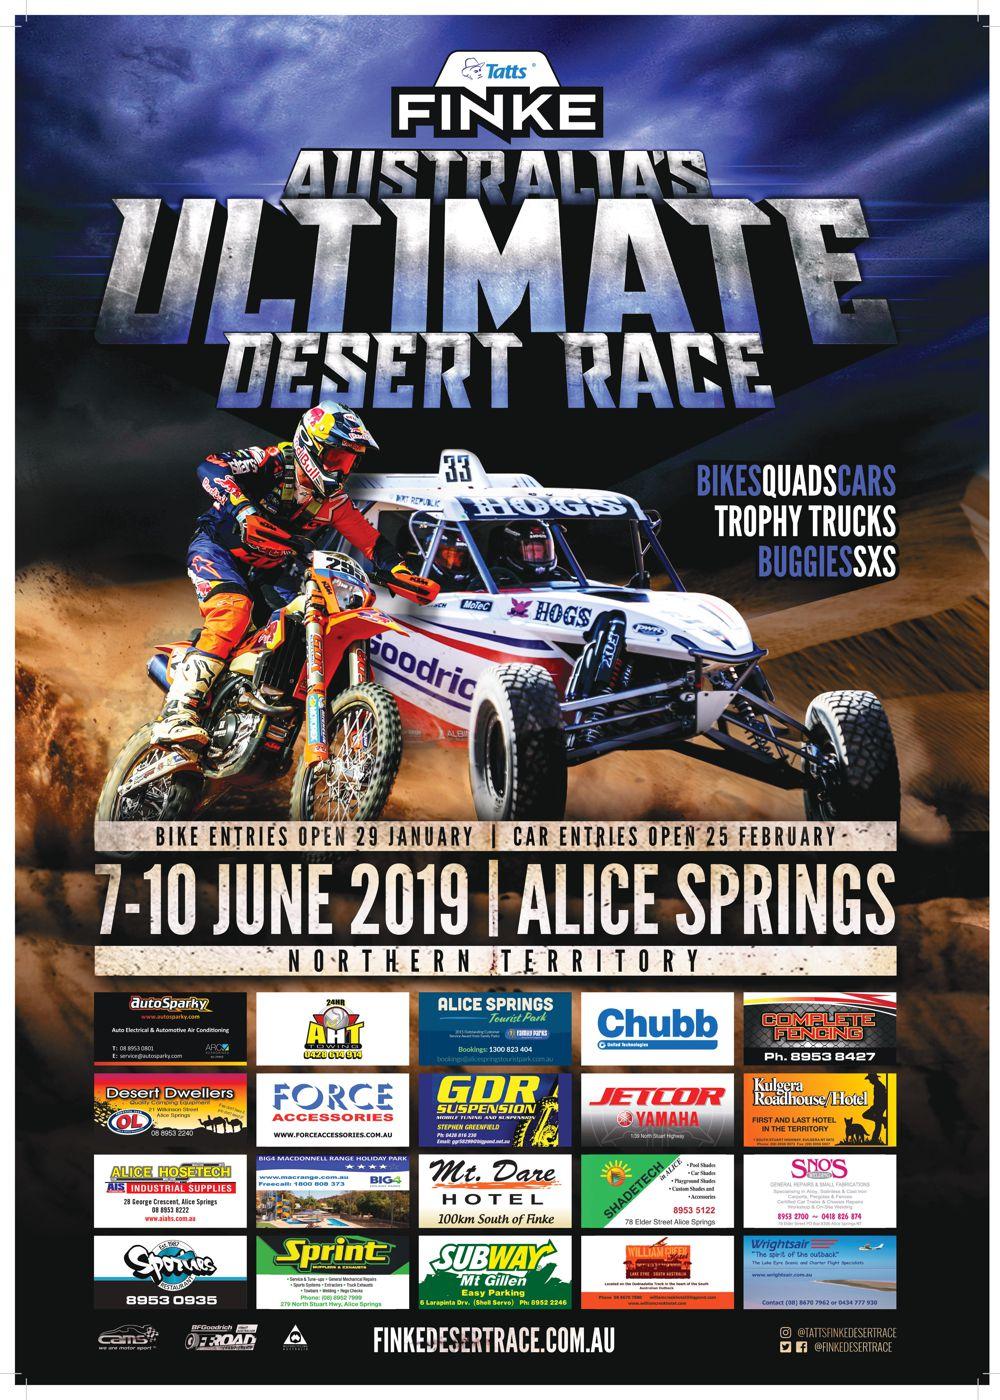 Wch 6 Events Finke Desert Race Image